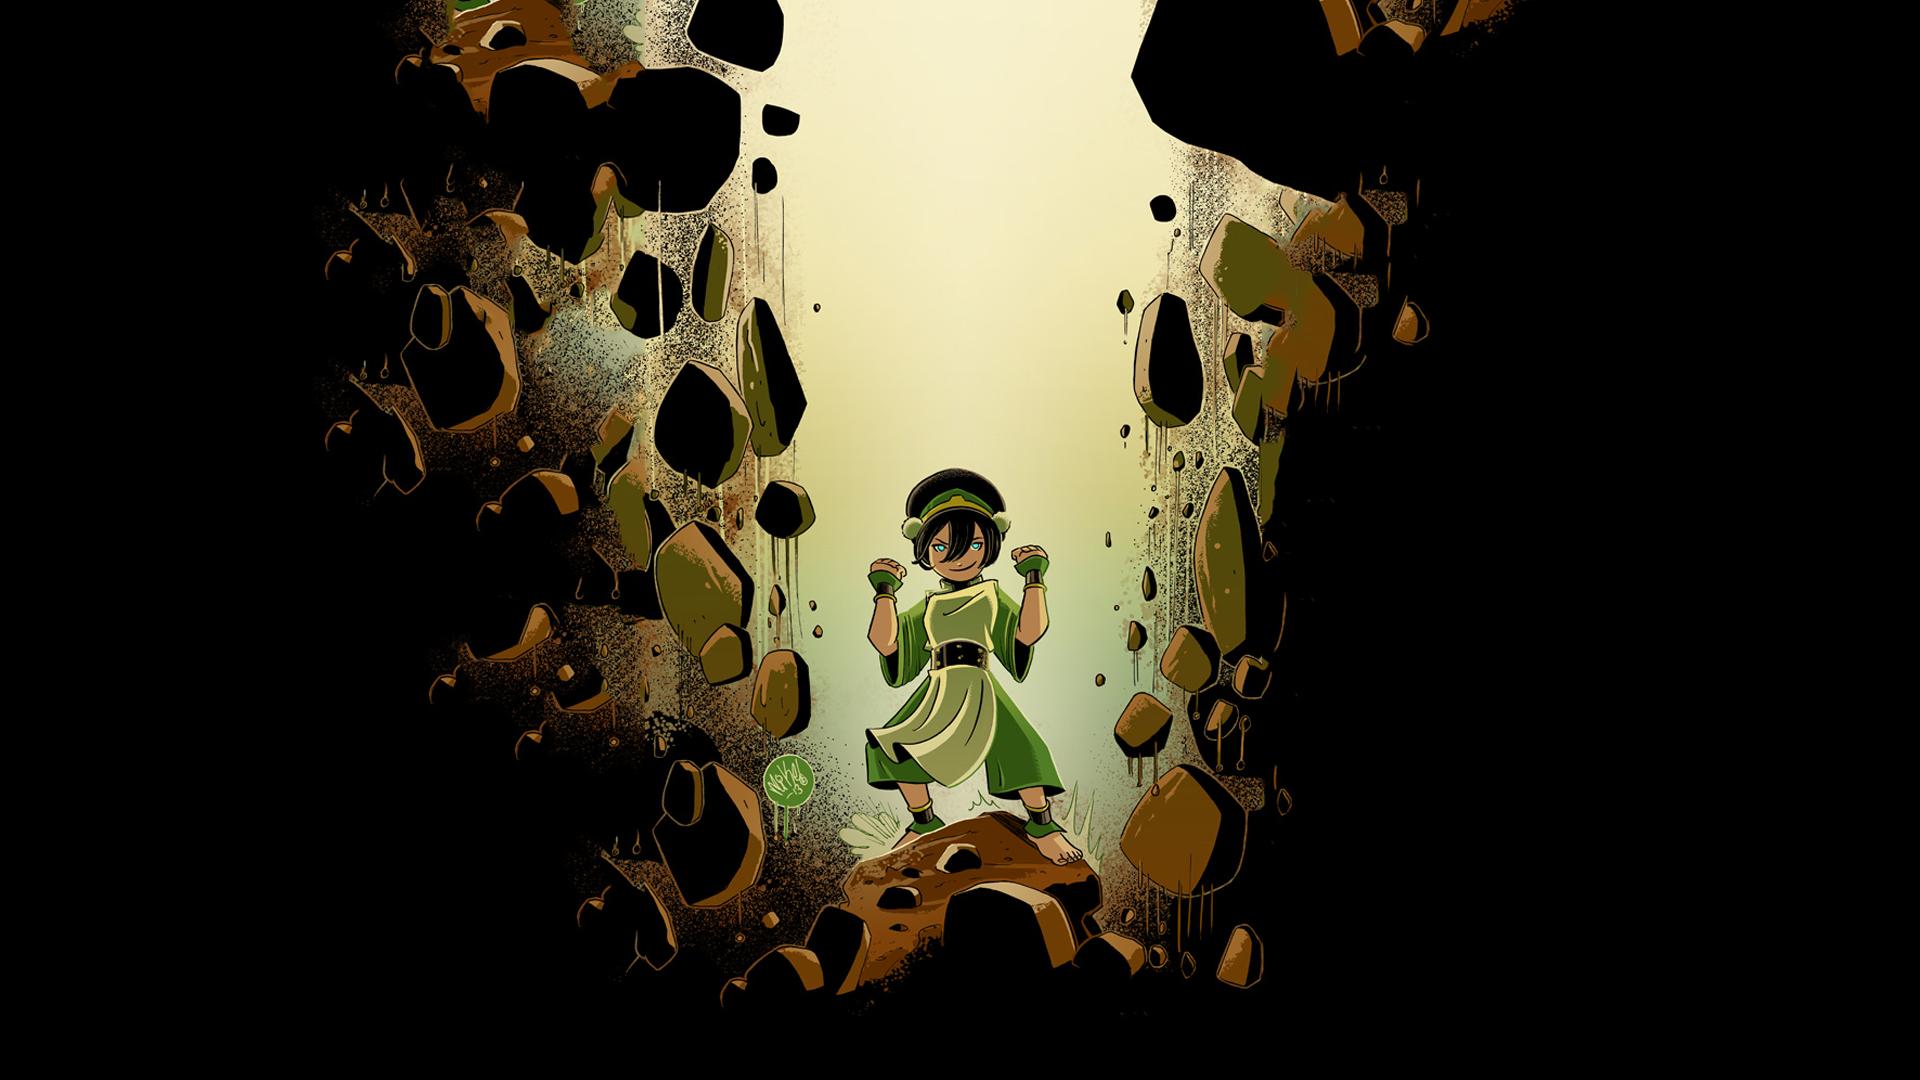 Avatar The Last Airbender Wallpaper 6